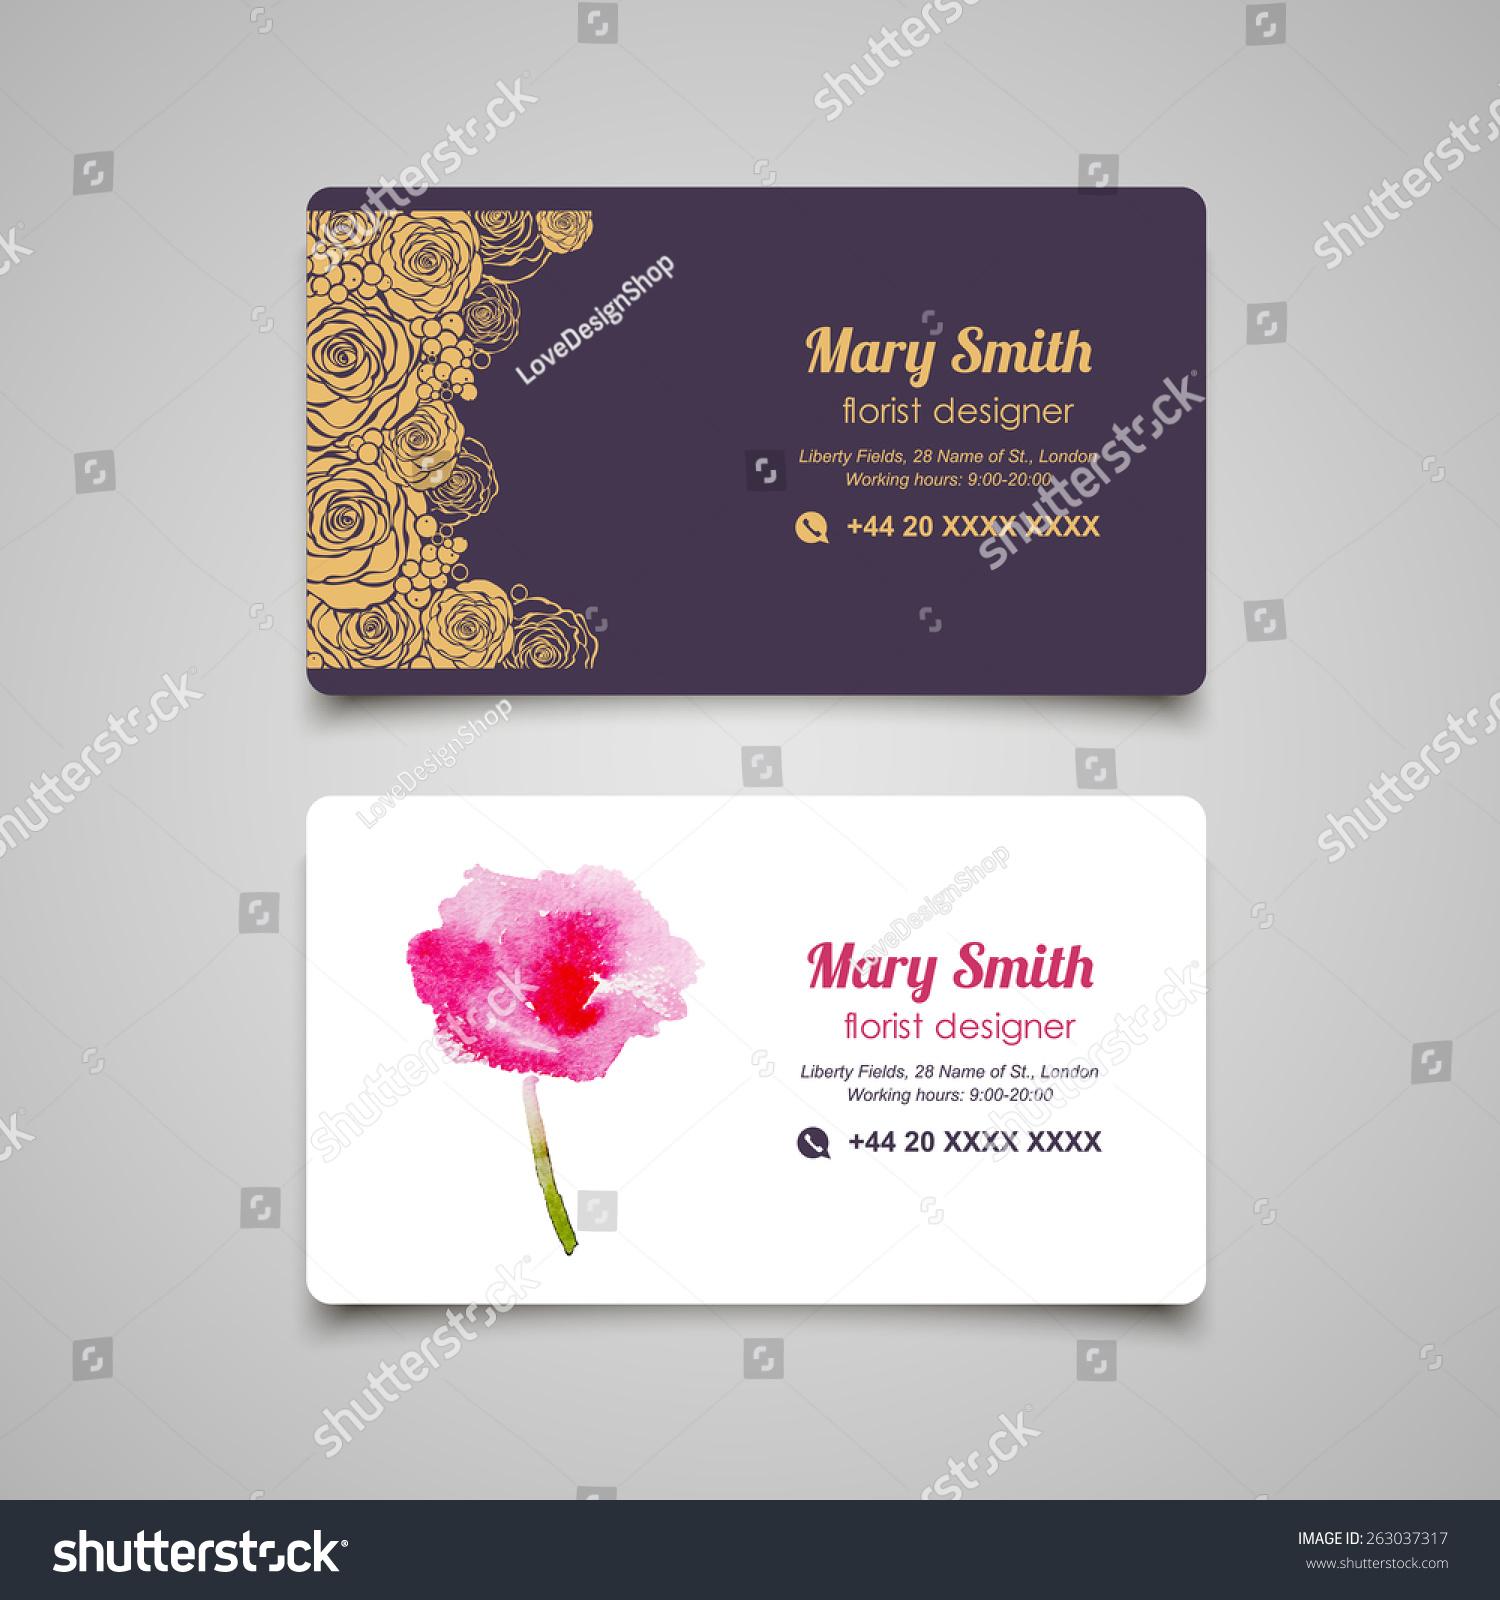 Florist Business Card Design Templates Set Stock Photo (Photo ...